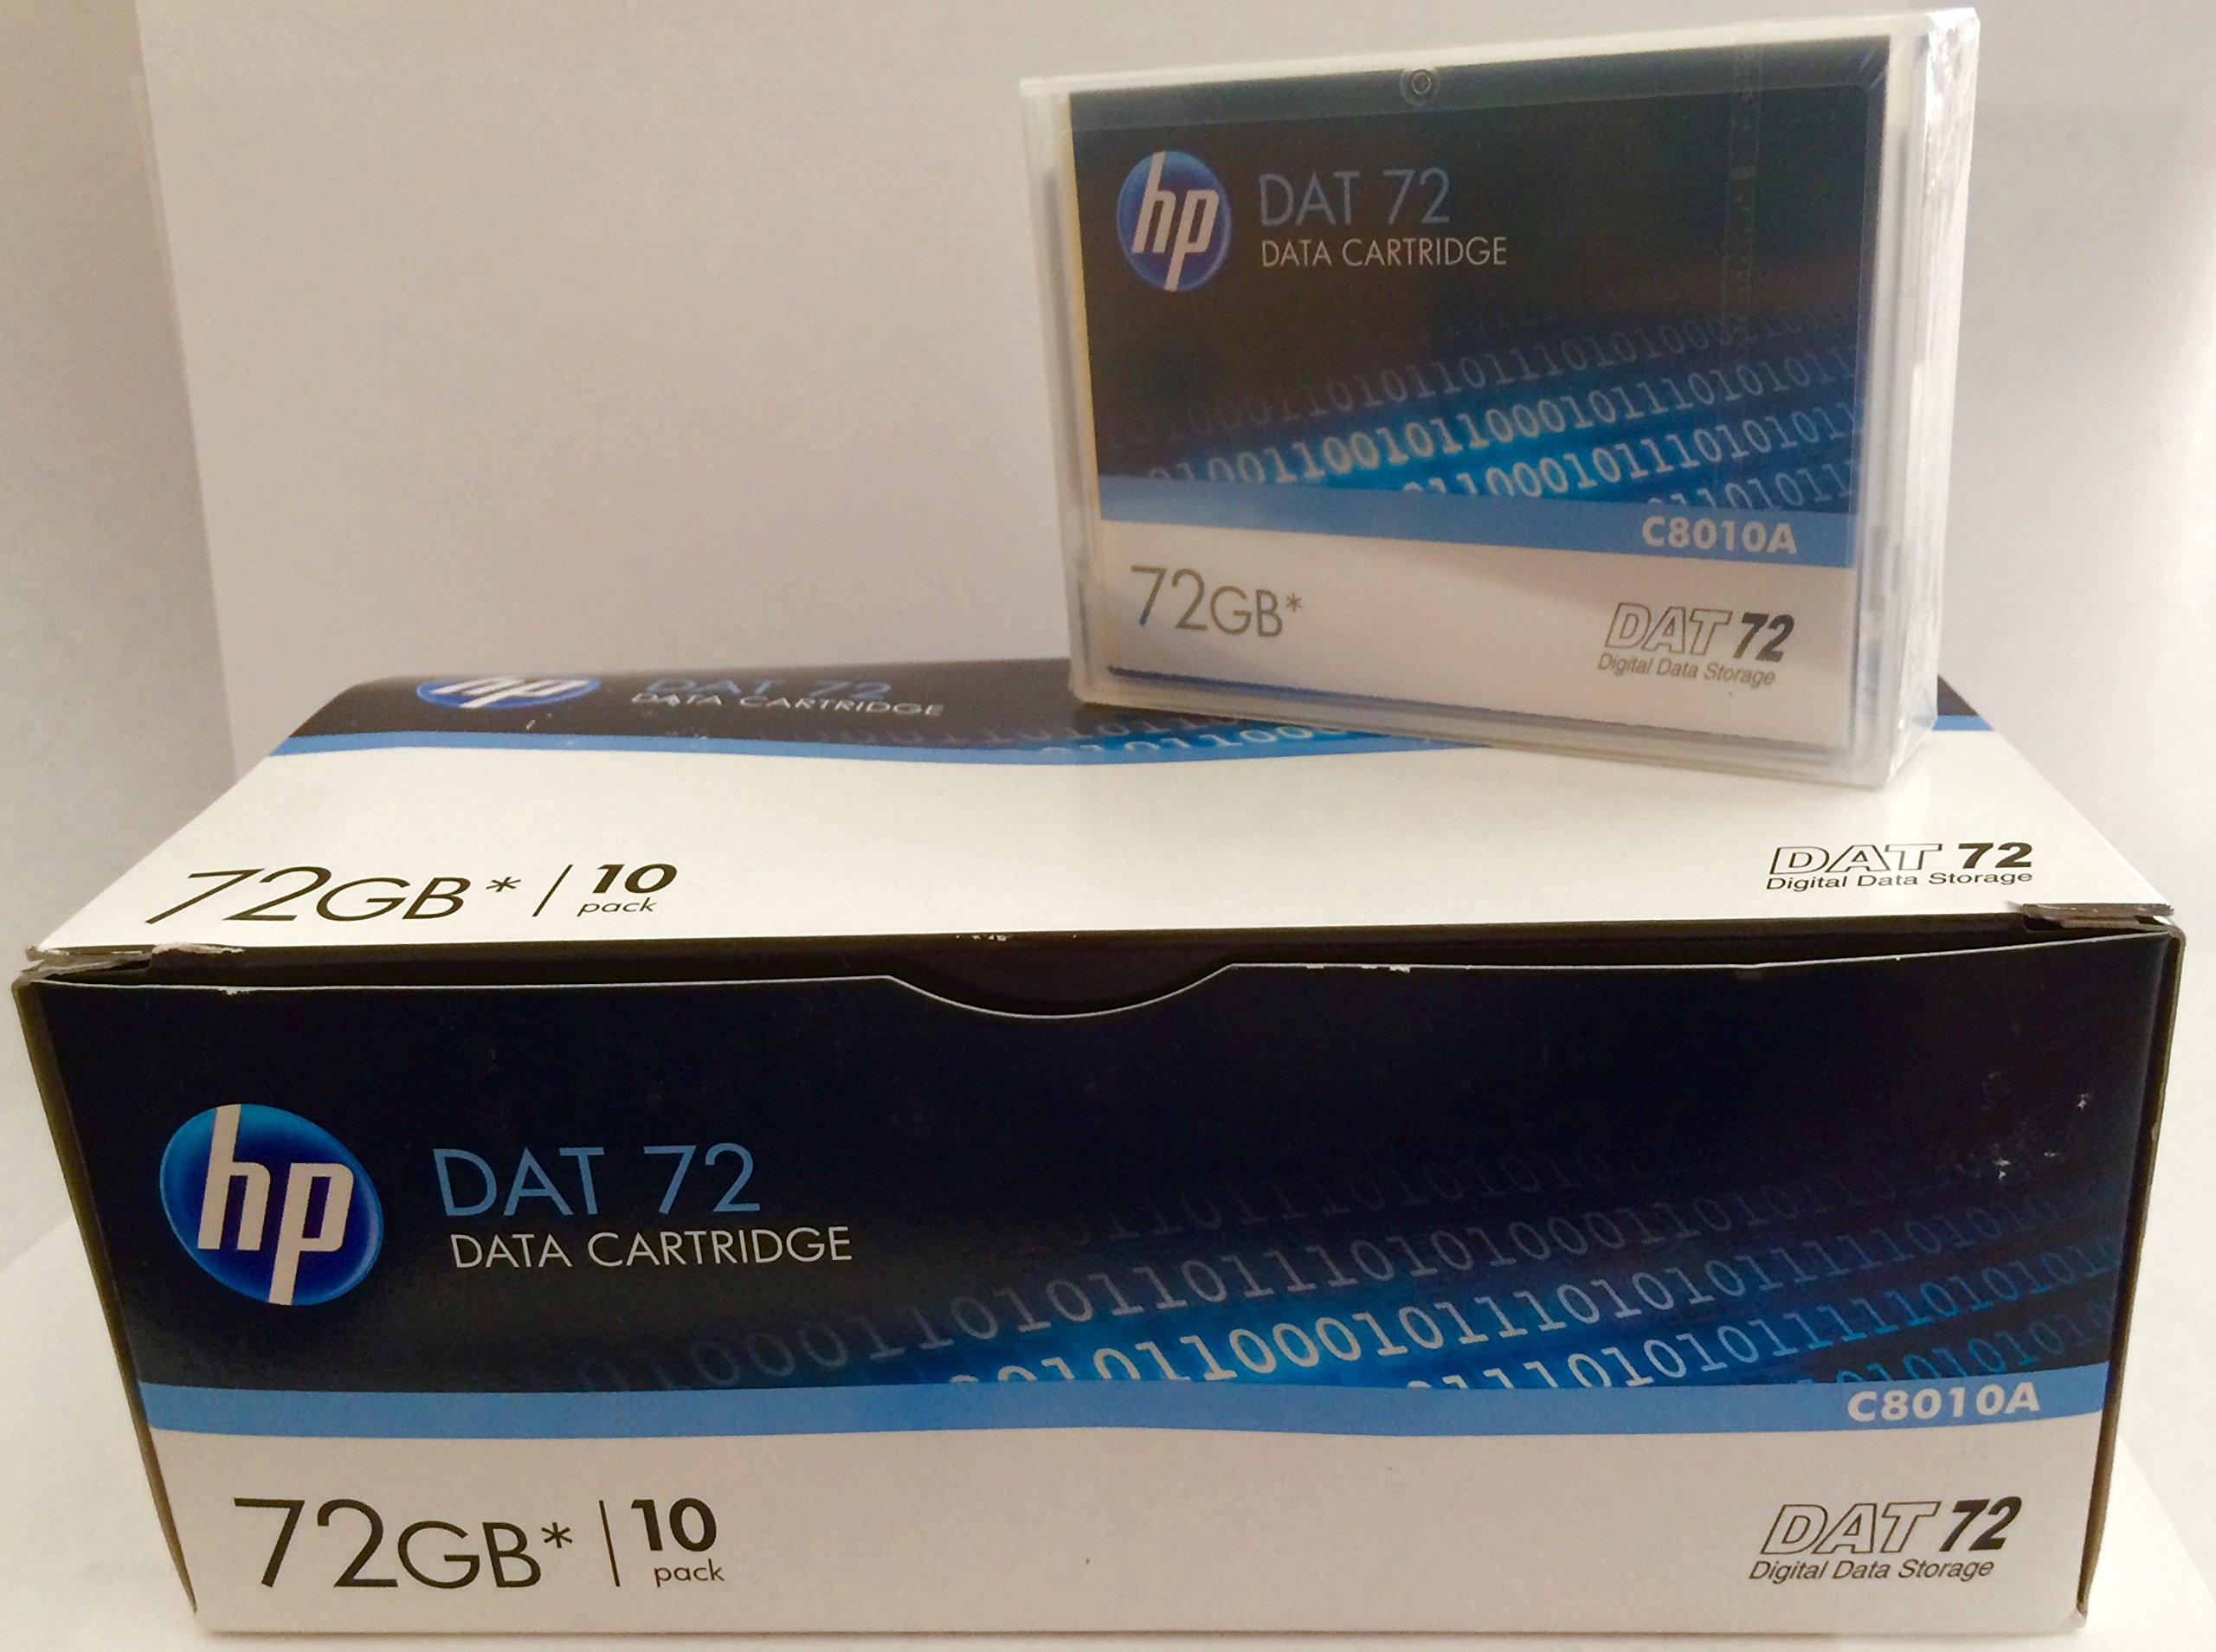 10 Pack HP C8010A DAT72 4/170 DDS5 Media 36/72GB(NEW)